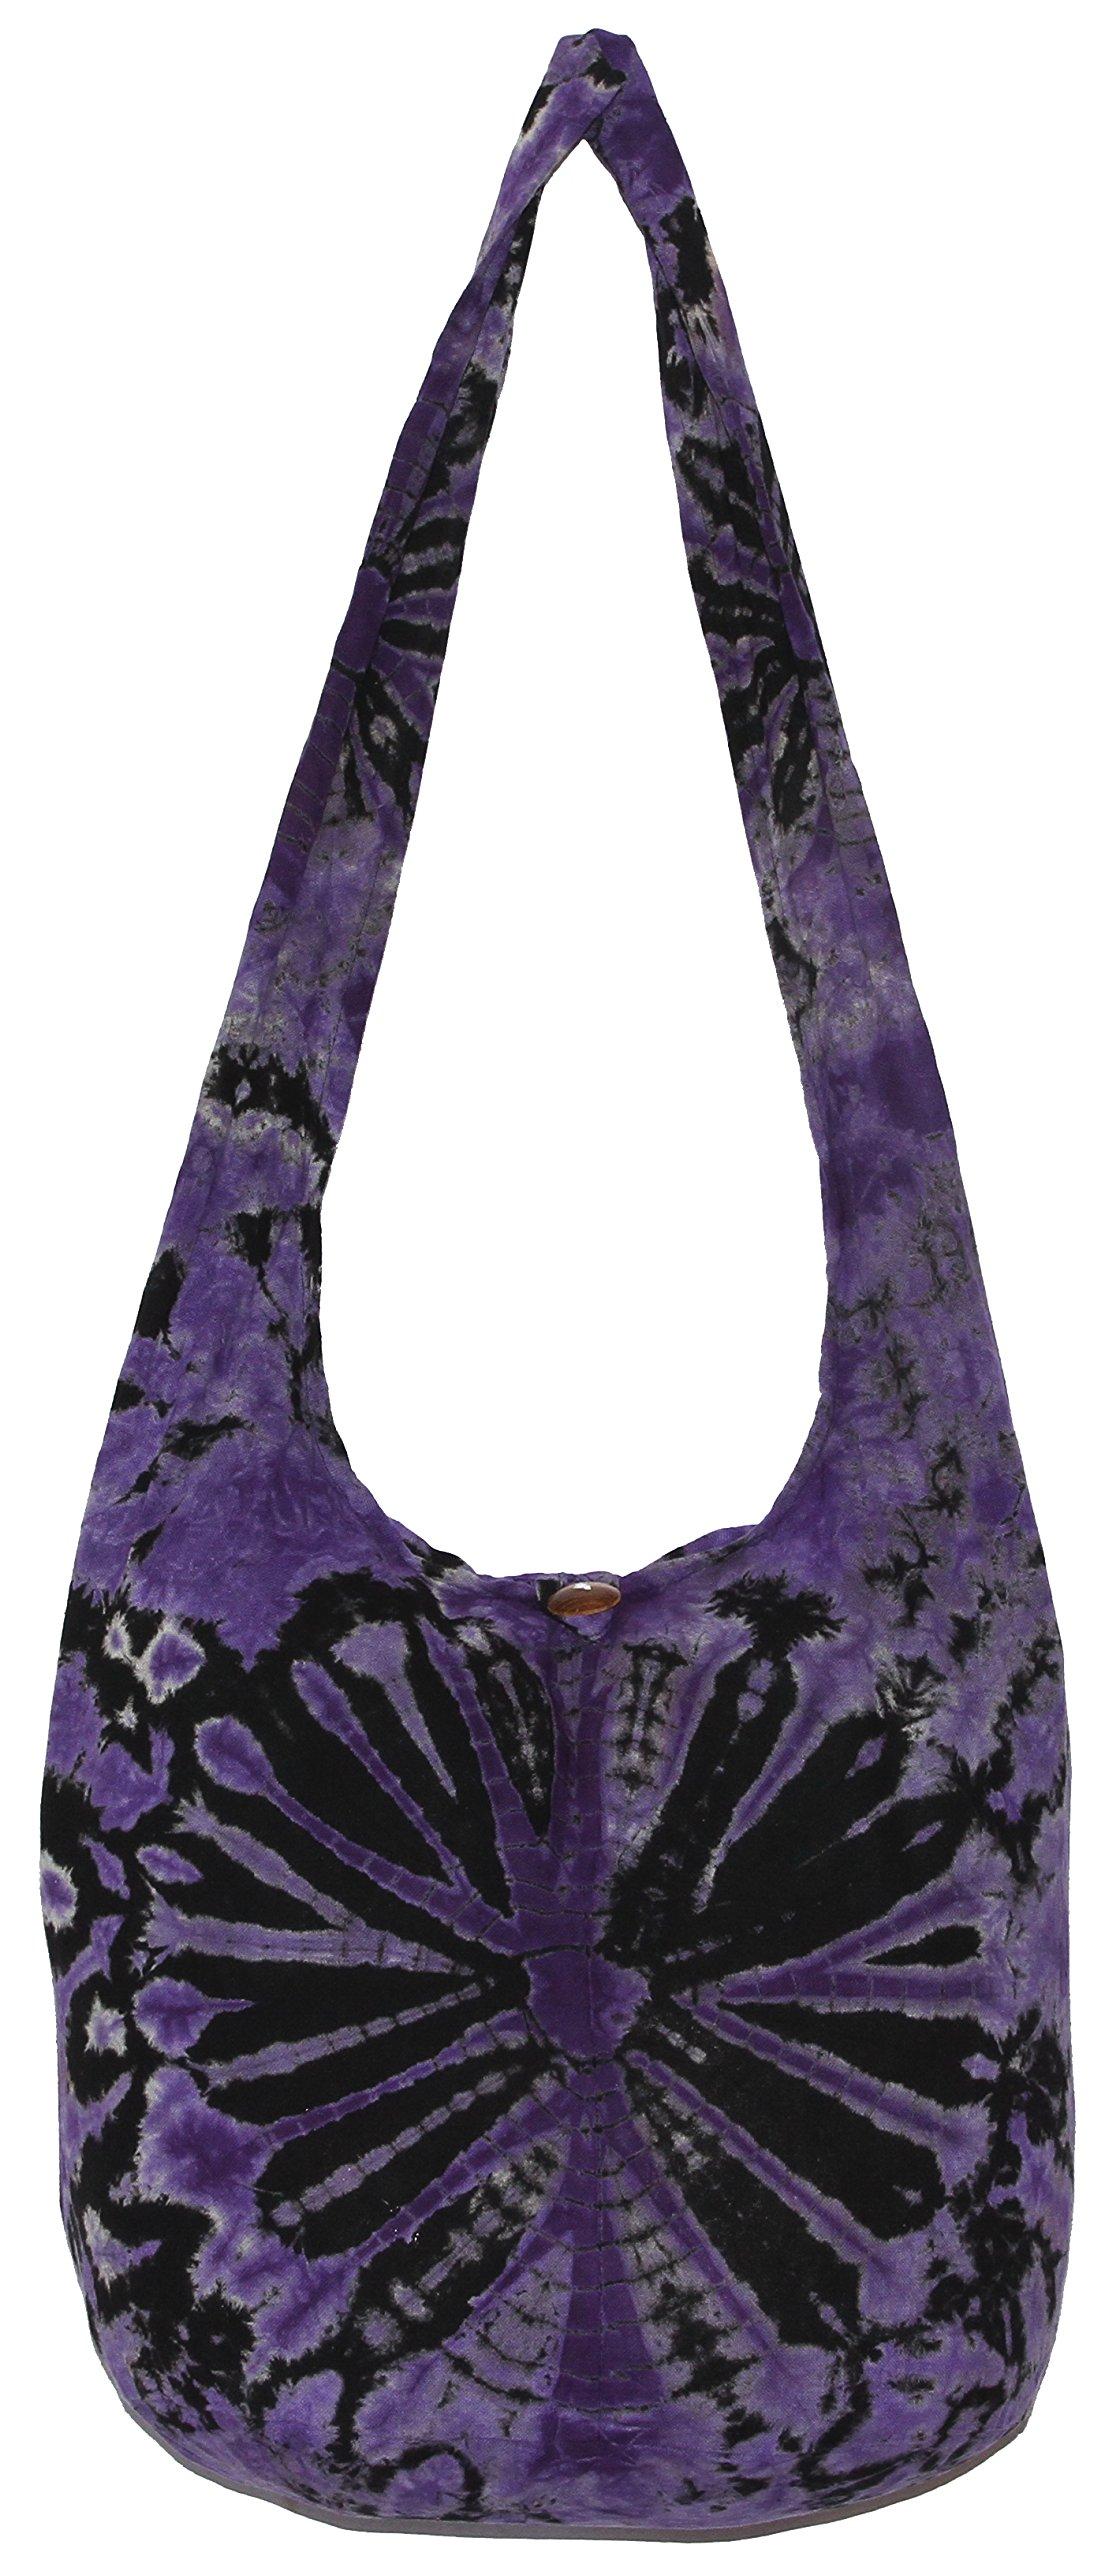 TIE DYE Crossbody Bohemian Shoulder Bag Hobo Purse Big 39'' (VioletBlack)